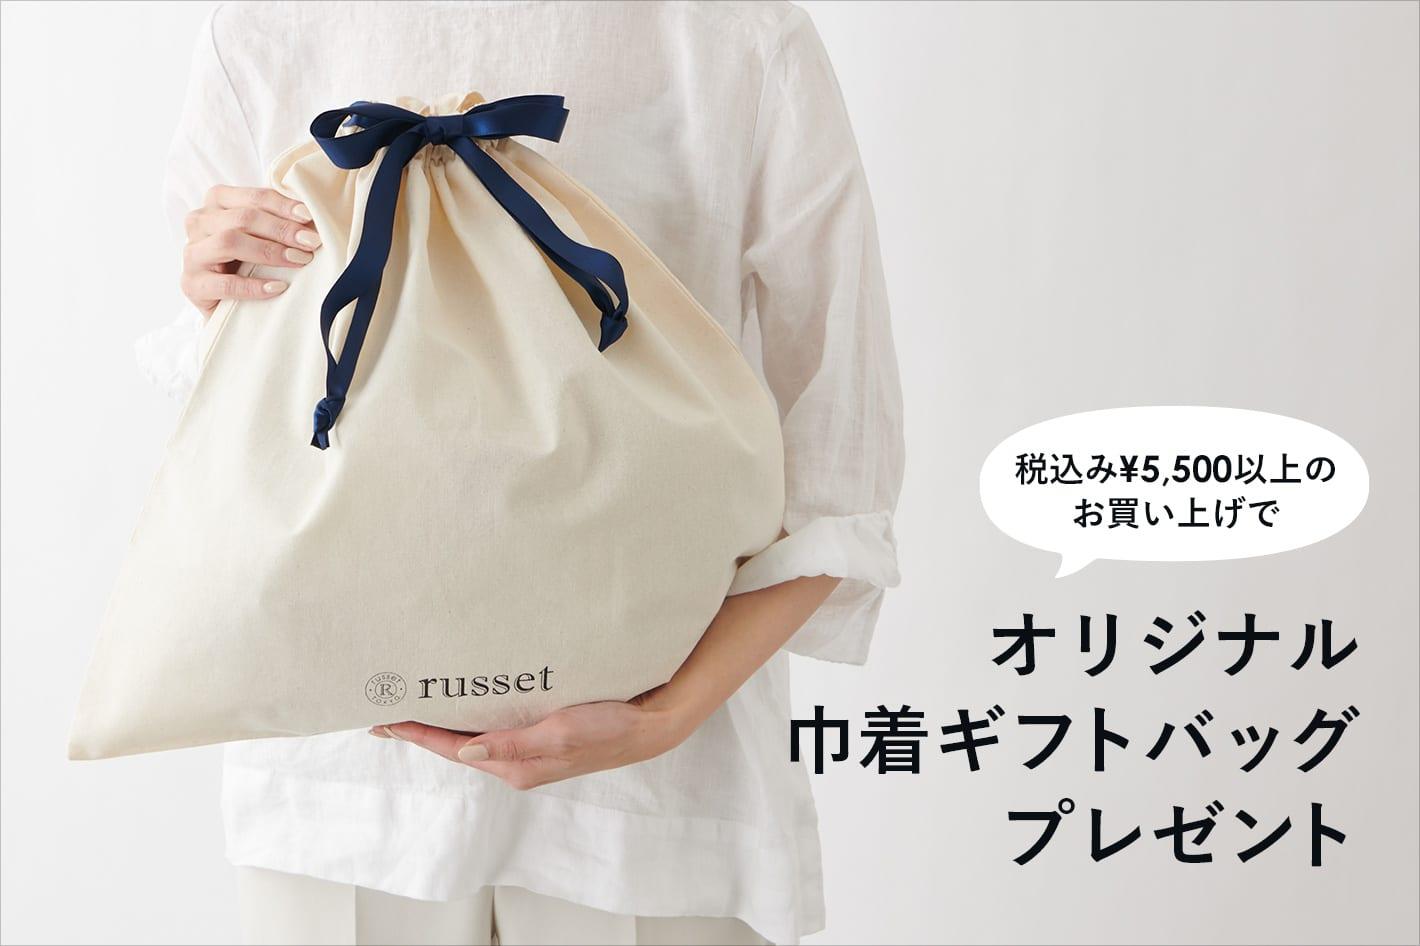 russet ◆オンラインストア限定企画◆オリジナル巾着ギフトバッグをプレゼント!